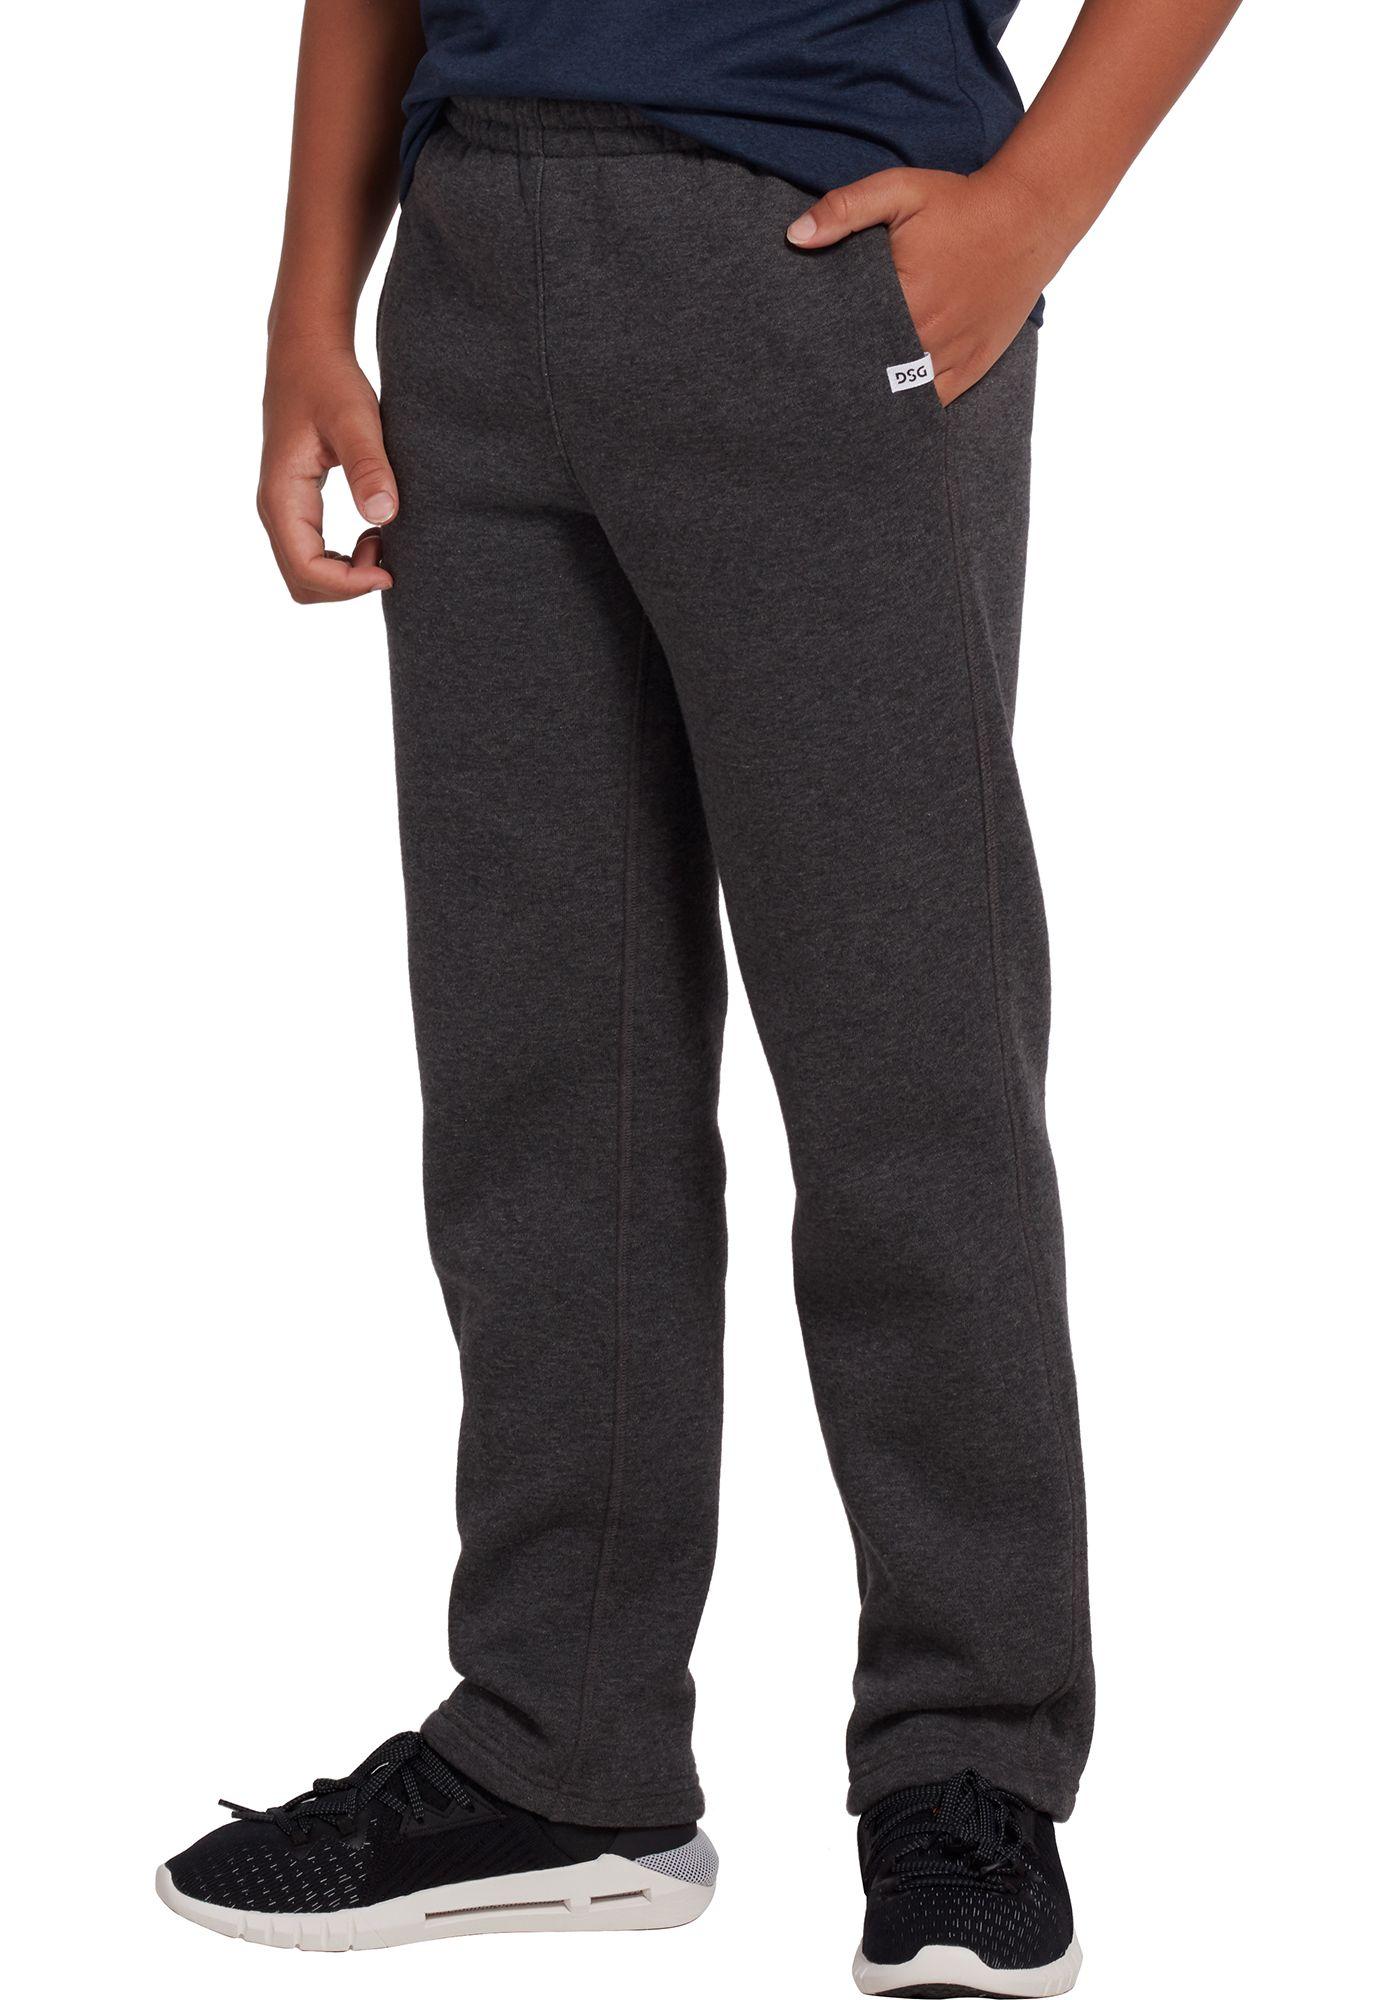 DSG Boys' Everyday Cotton Fleece Pant